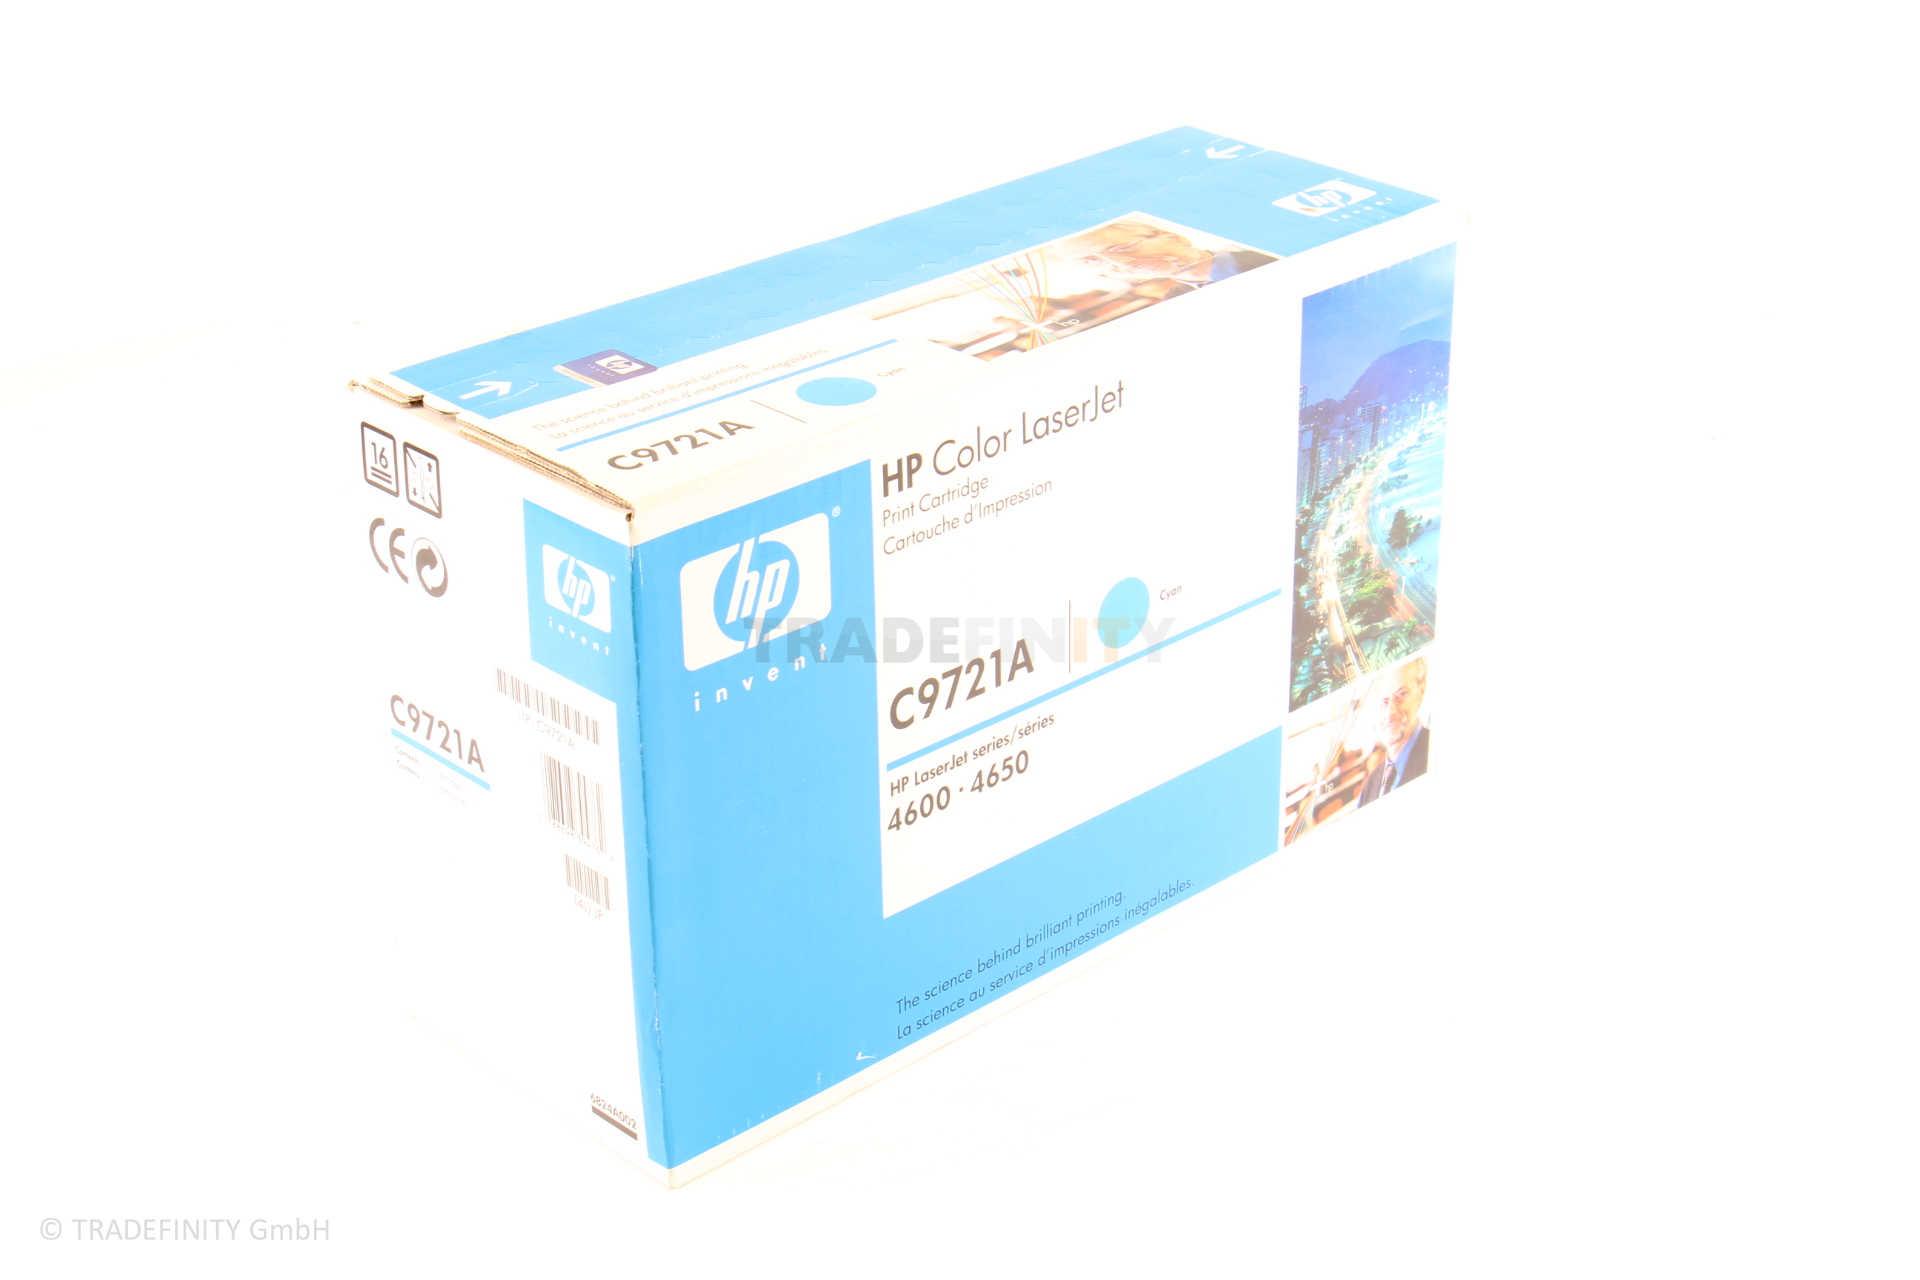 641A Cyan Toner Cartridge